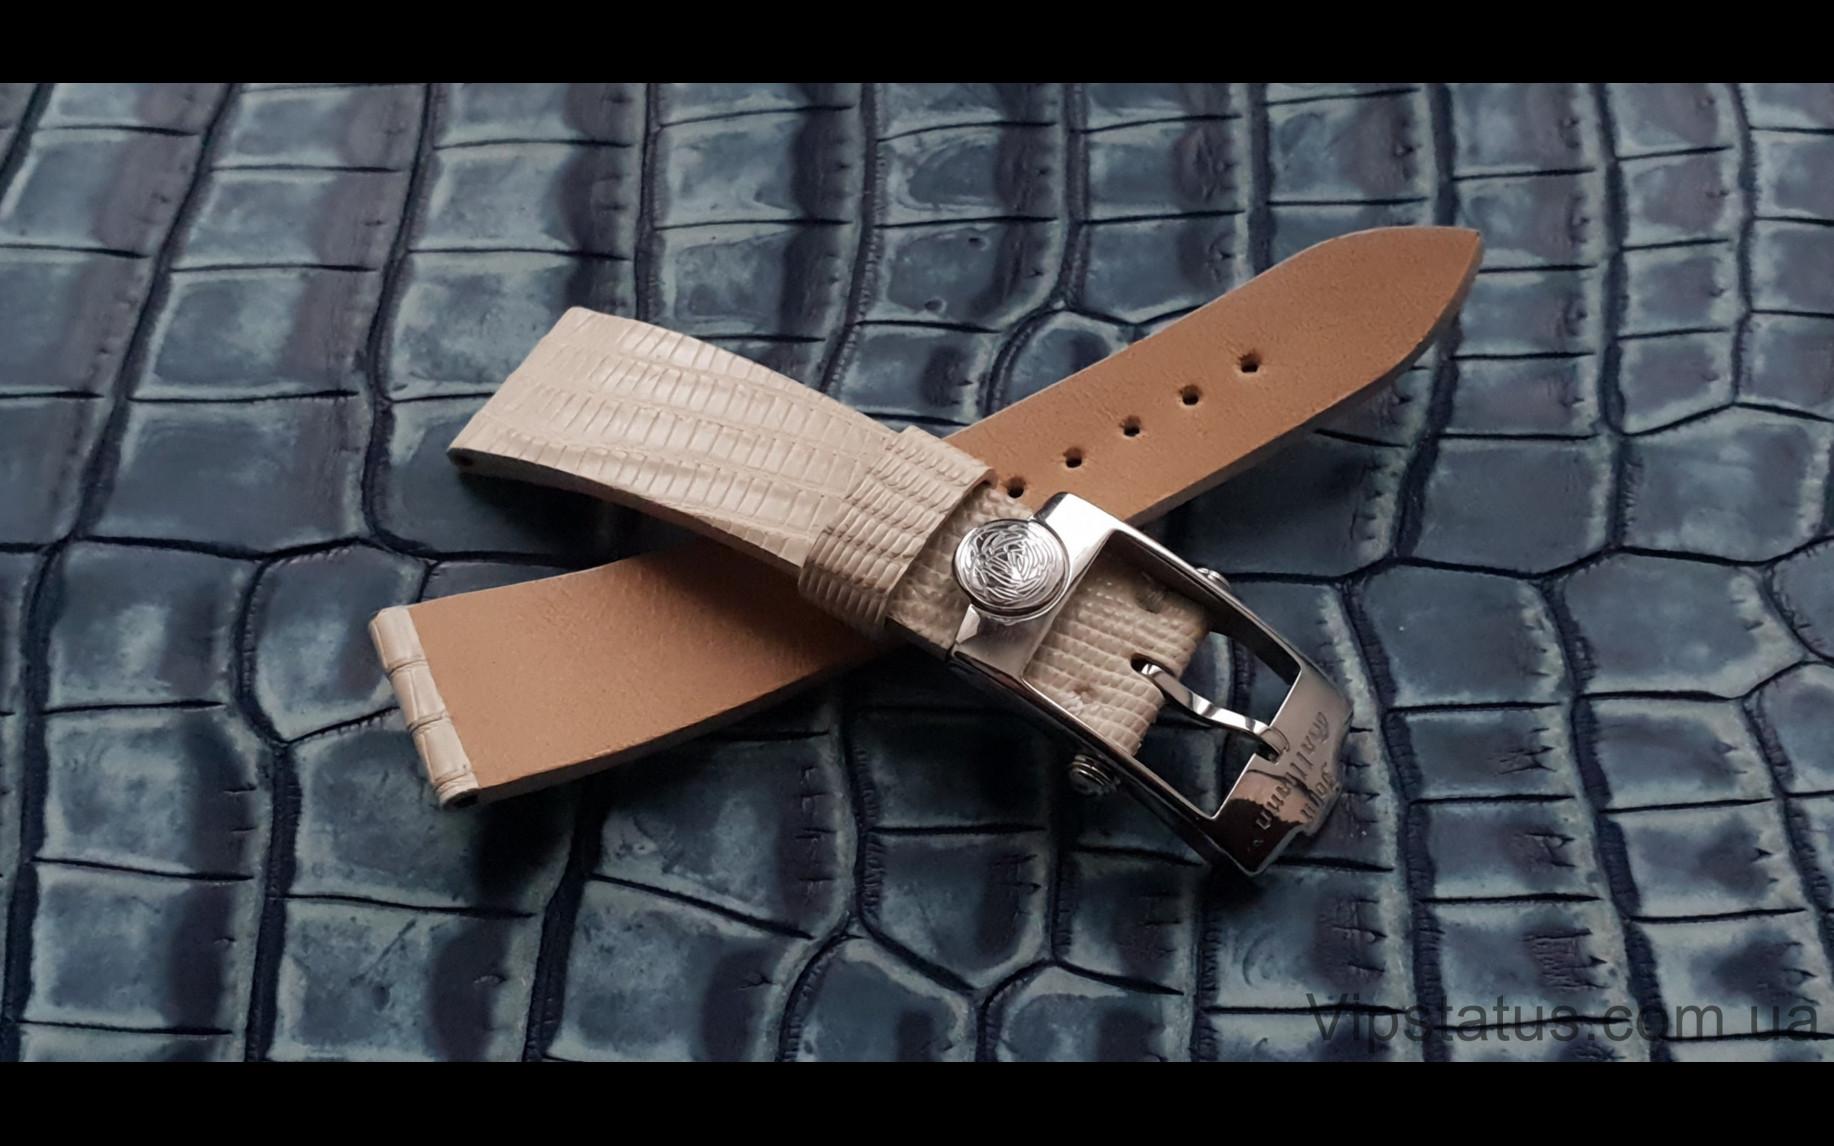 Elite Экзотический ремешок для часов John Galliano кожа крокодила Exotic Crocodile Strap for John Galliano watches image 3